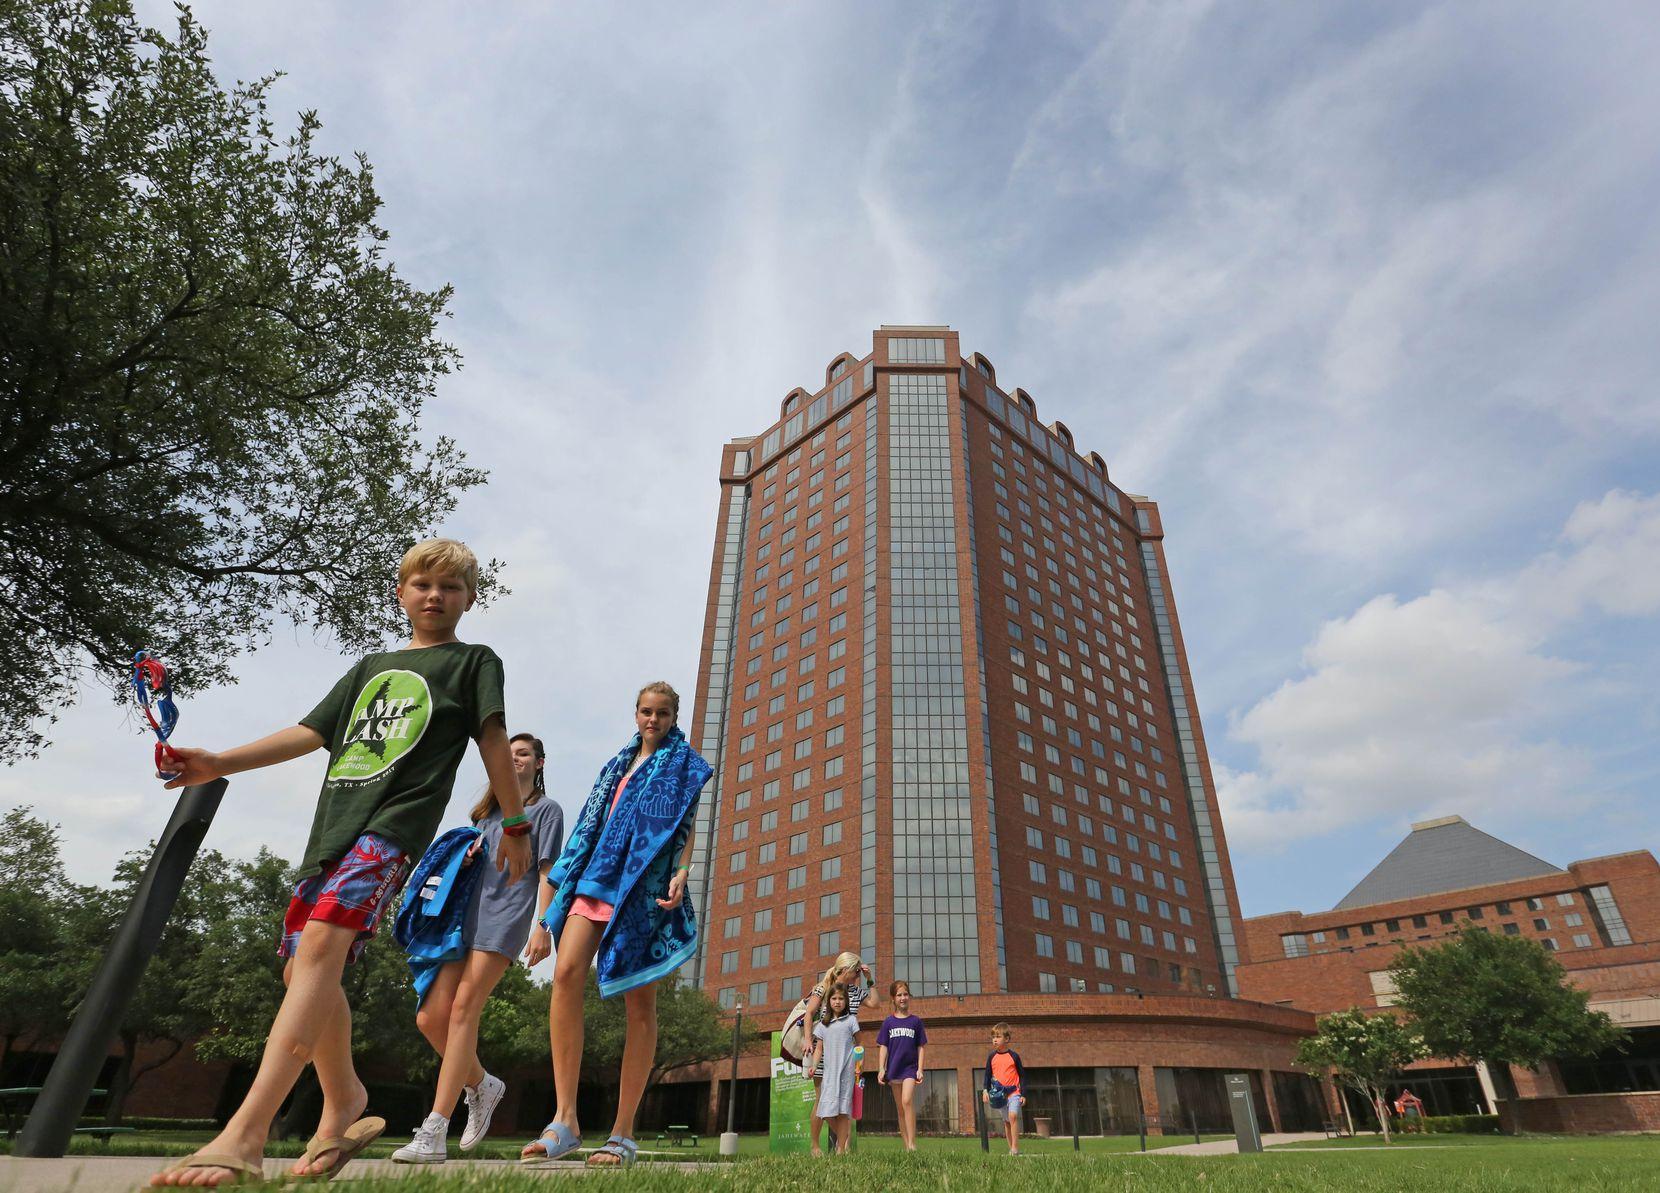 Dallas' Hilton Anatole Hotel made the top five meeting hotel ranking.